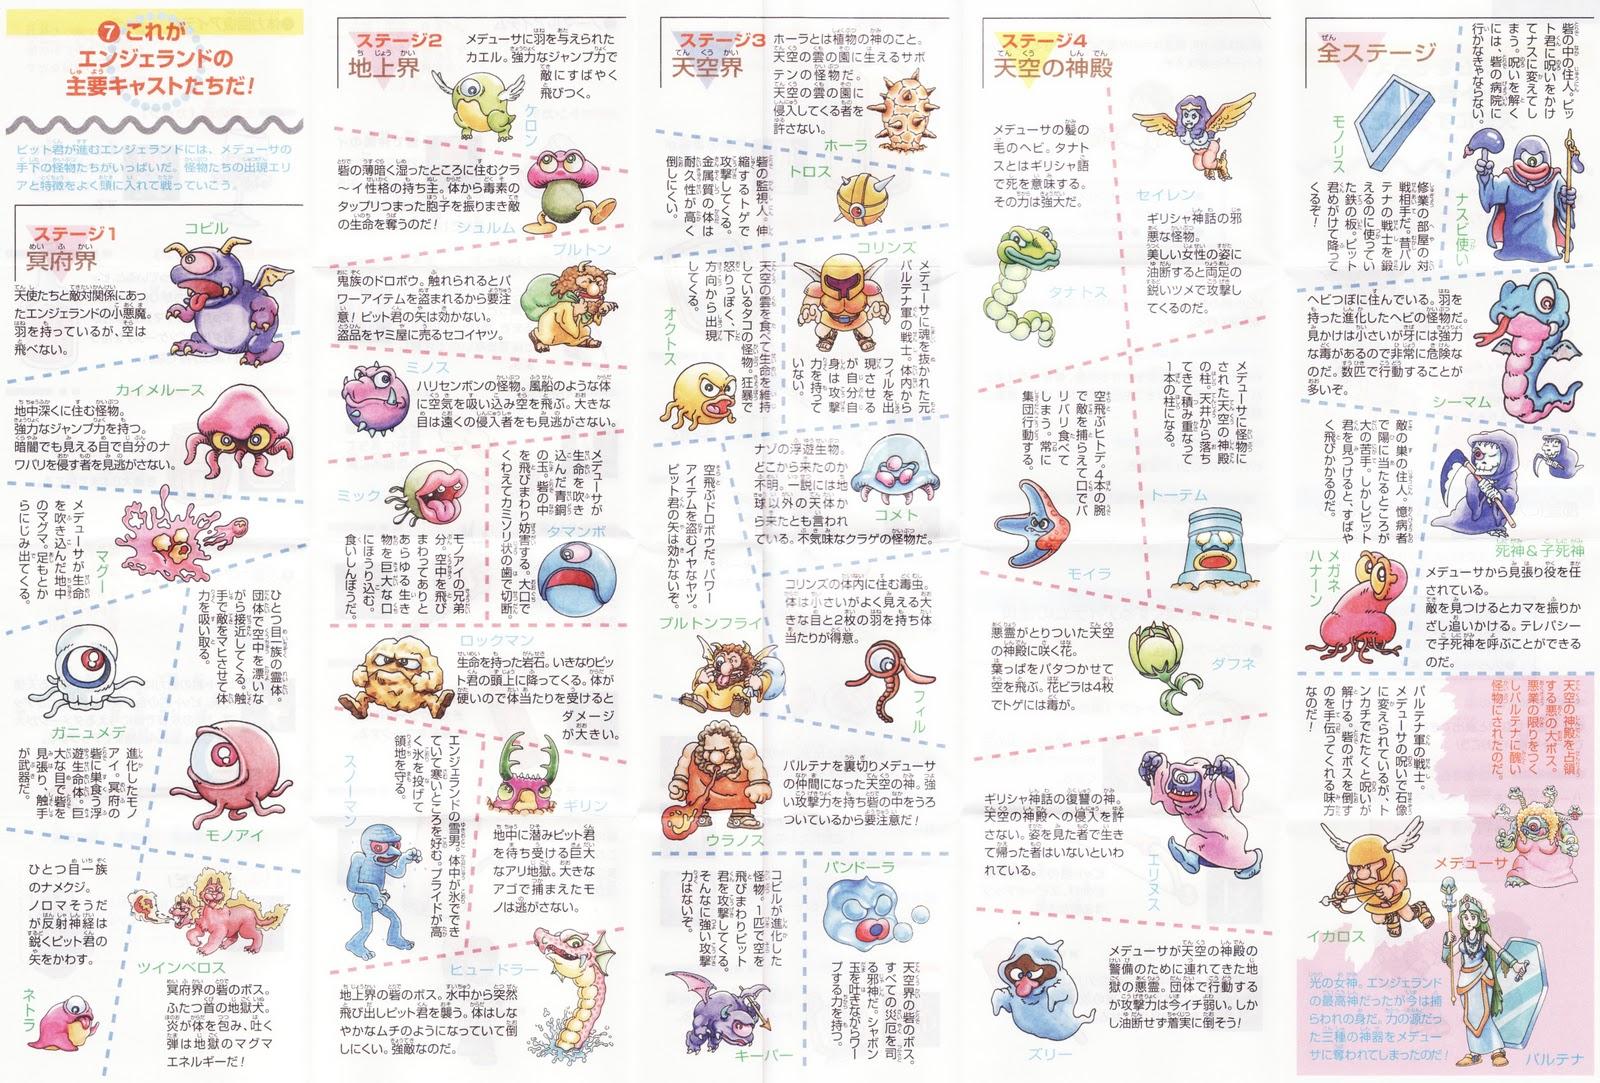 the gay gamer manual stimulation hikari shinwa parutena no kagami rh thegaygamer com kid icarus nes walkthrough 1-4 kid icarus nes map 3-4